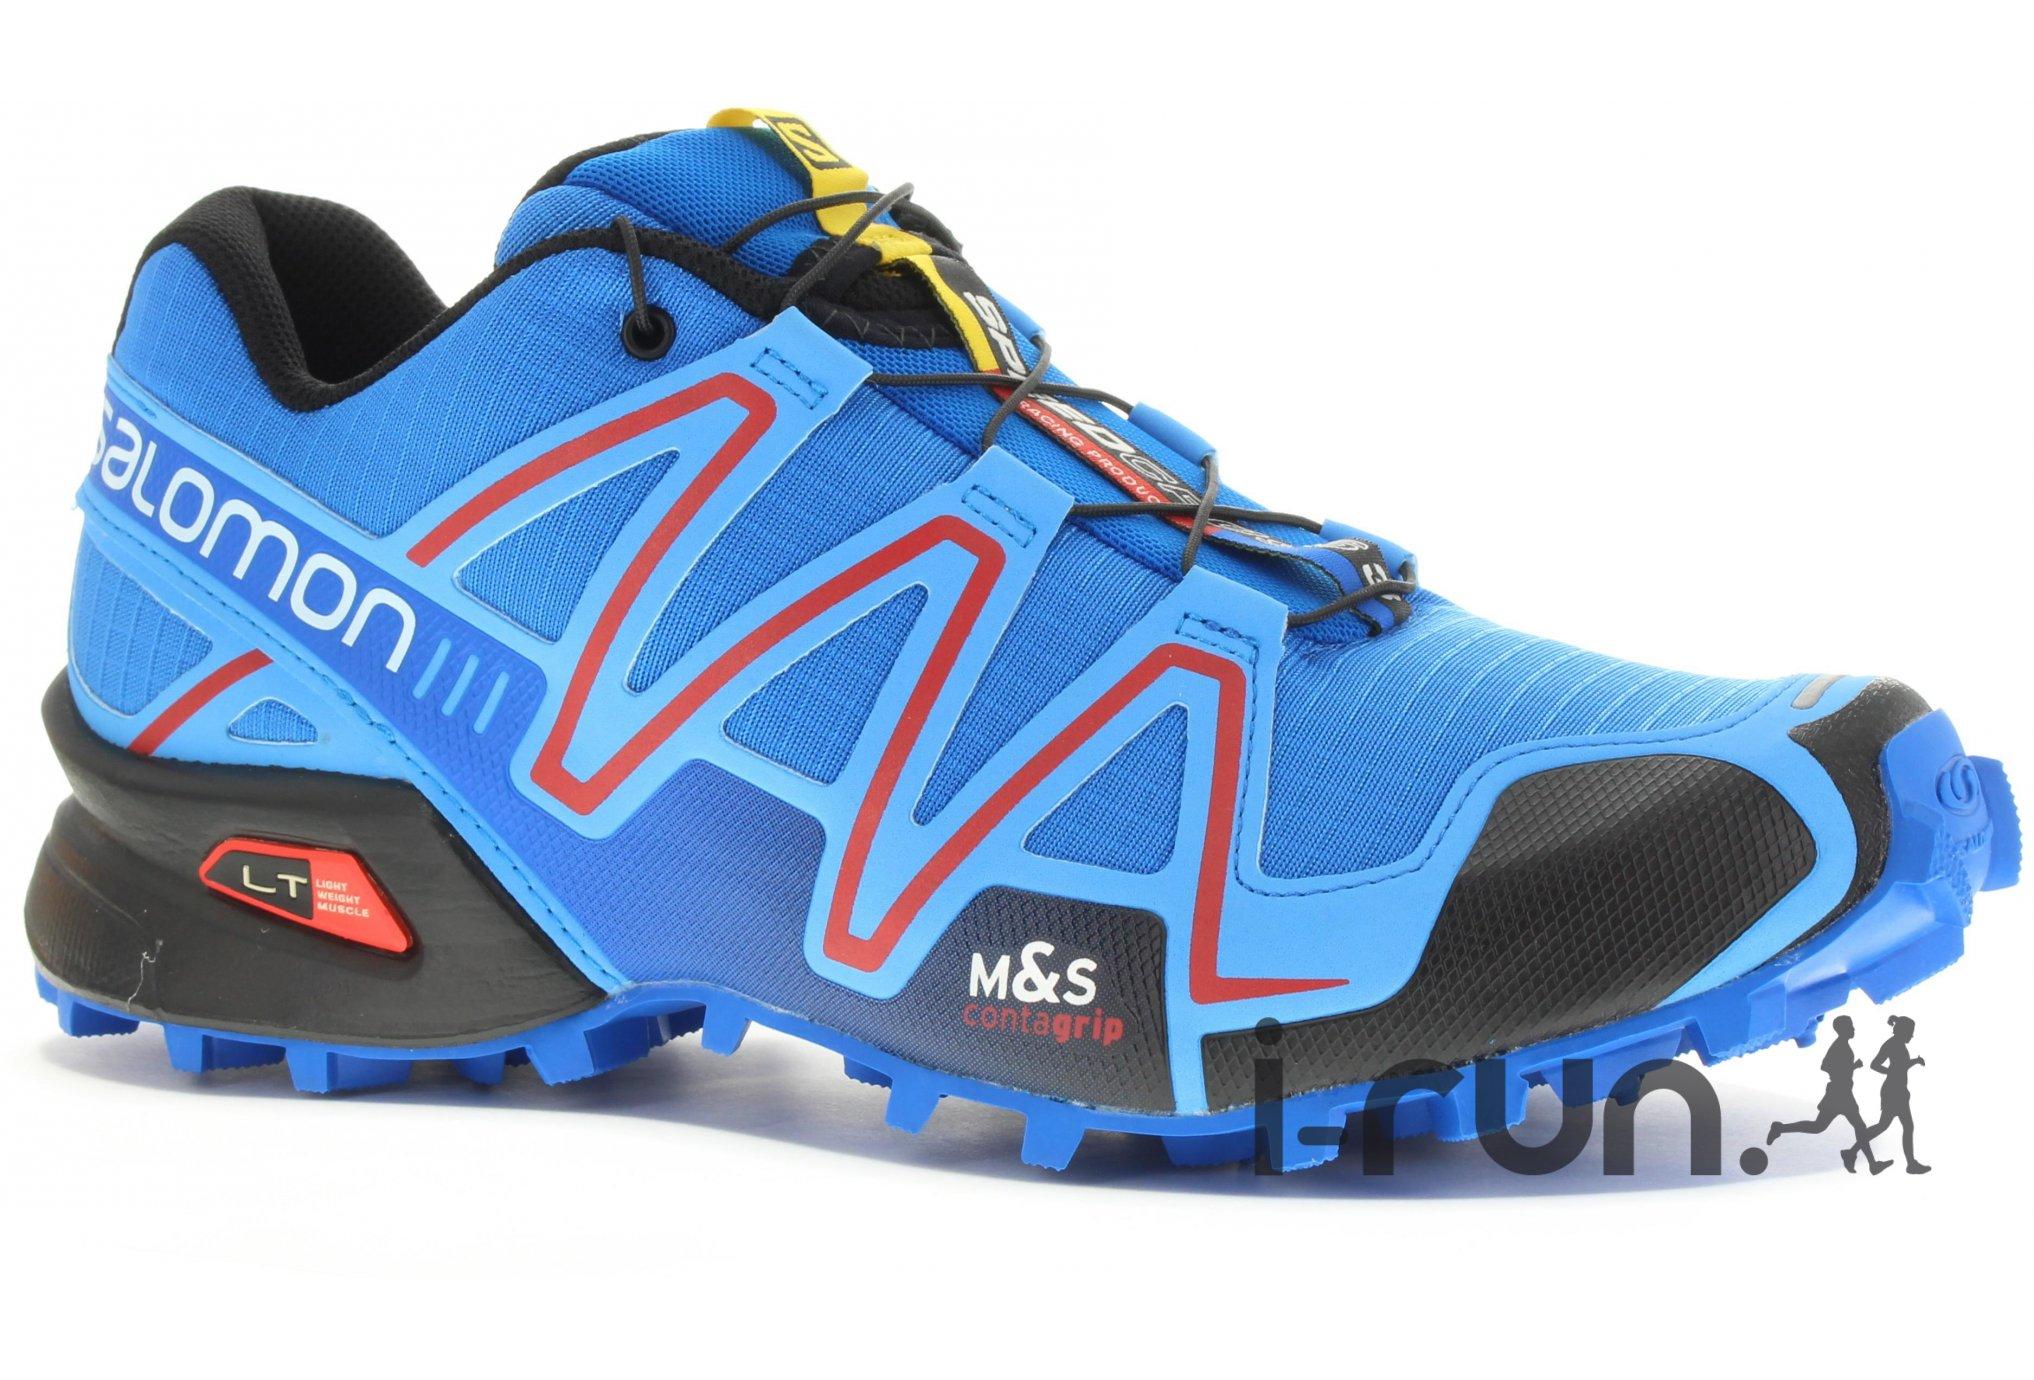 new product 85fbc 48b08 salomon-speedcross-3-m-chaussures-homme-107413-1-